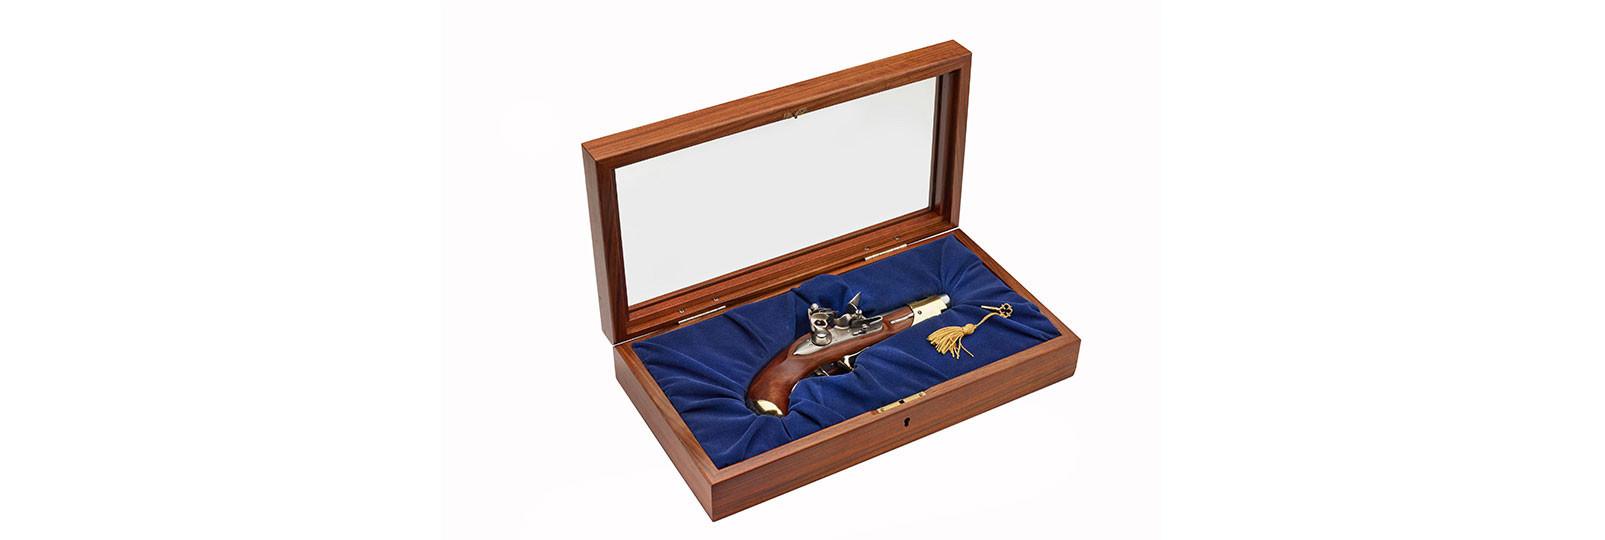 Pistola Mod.1814 Reale dei Carabinieri in cofanetto